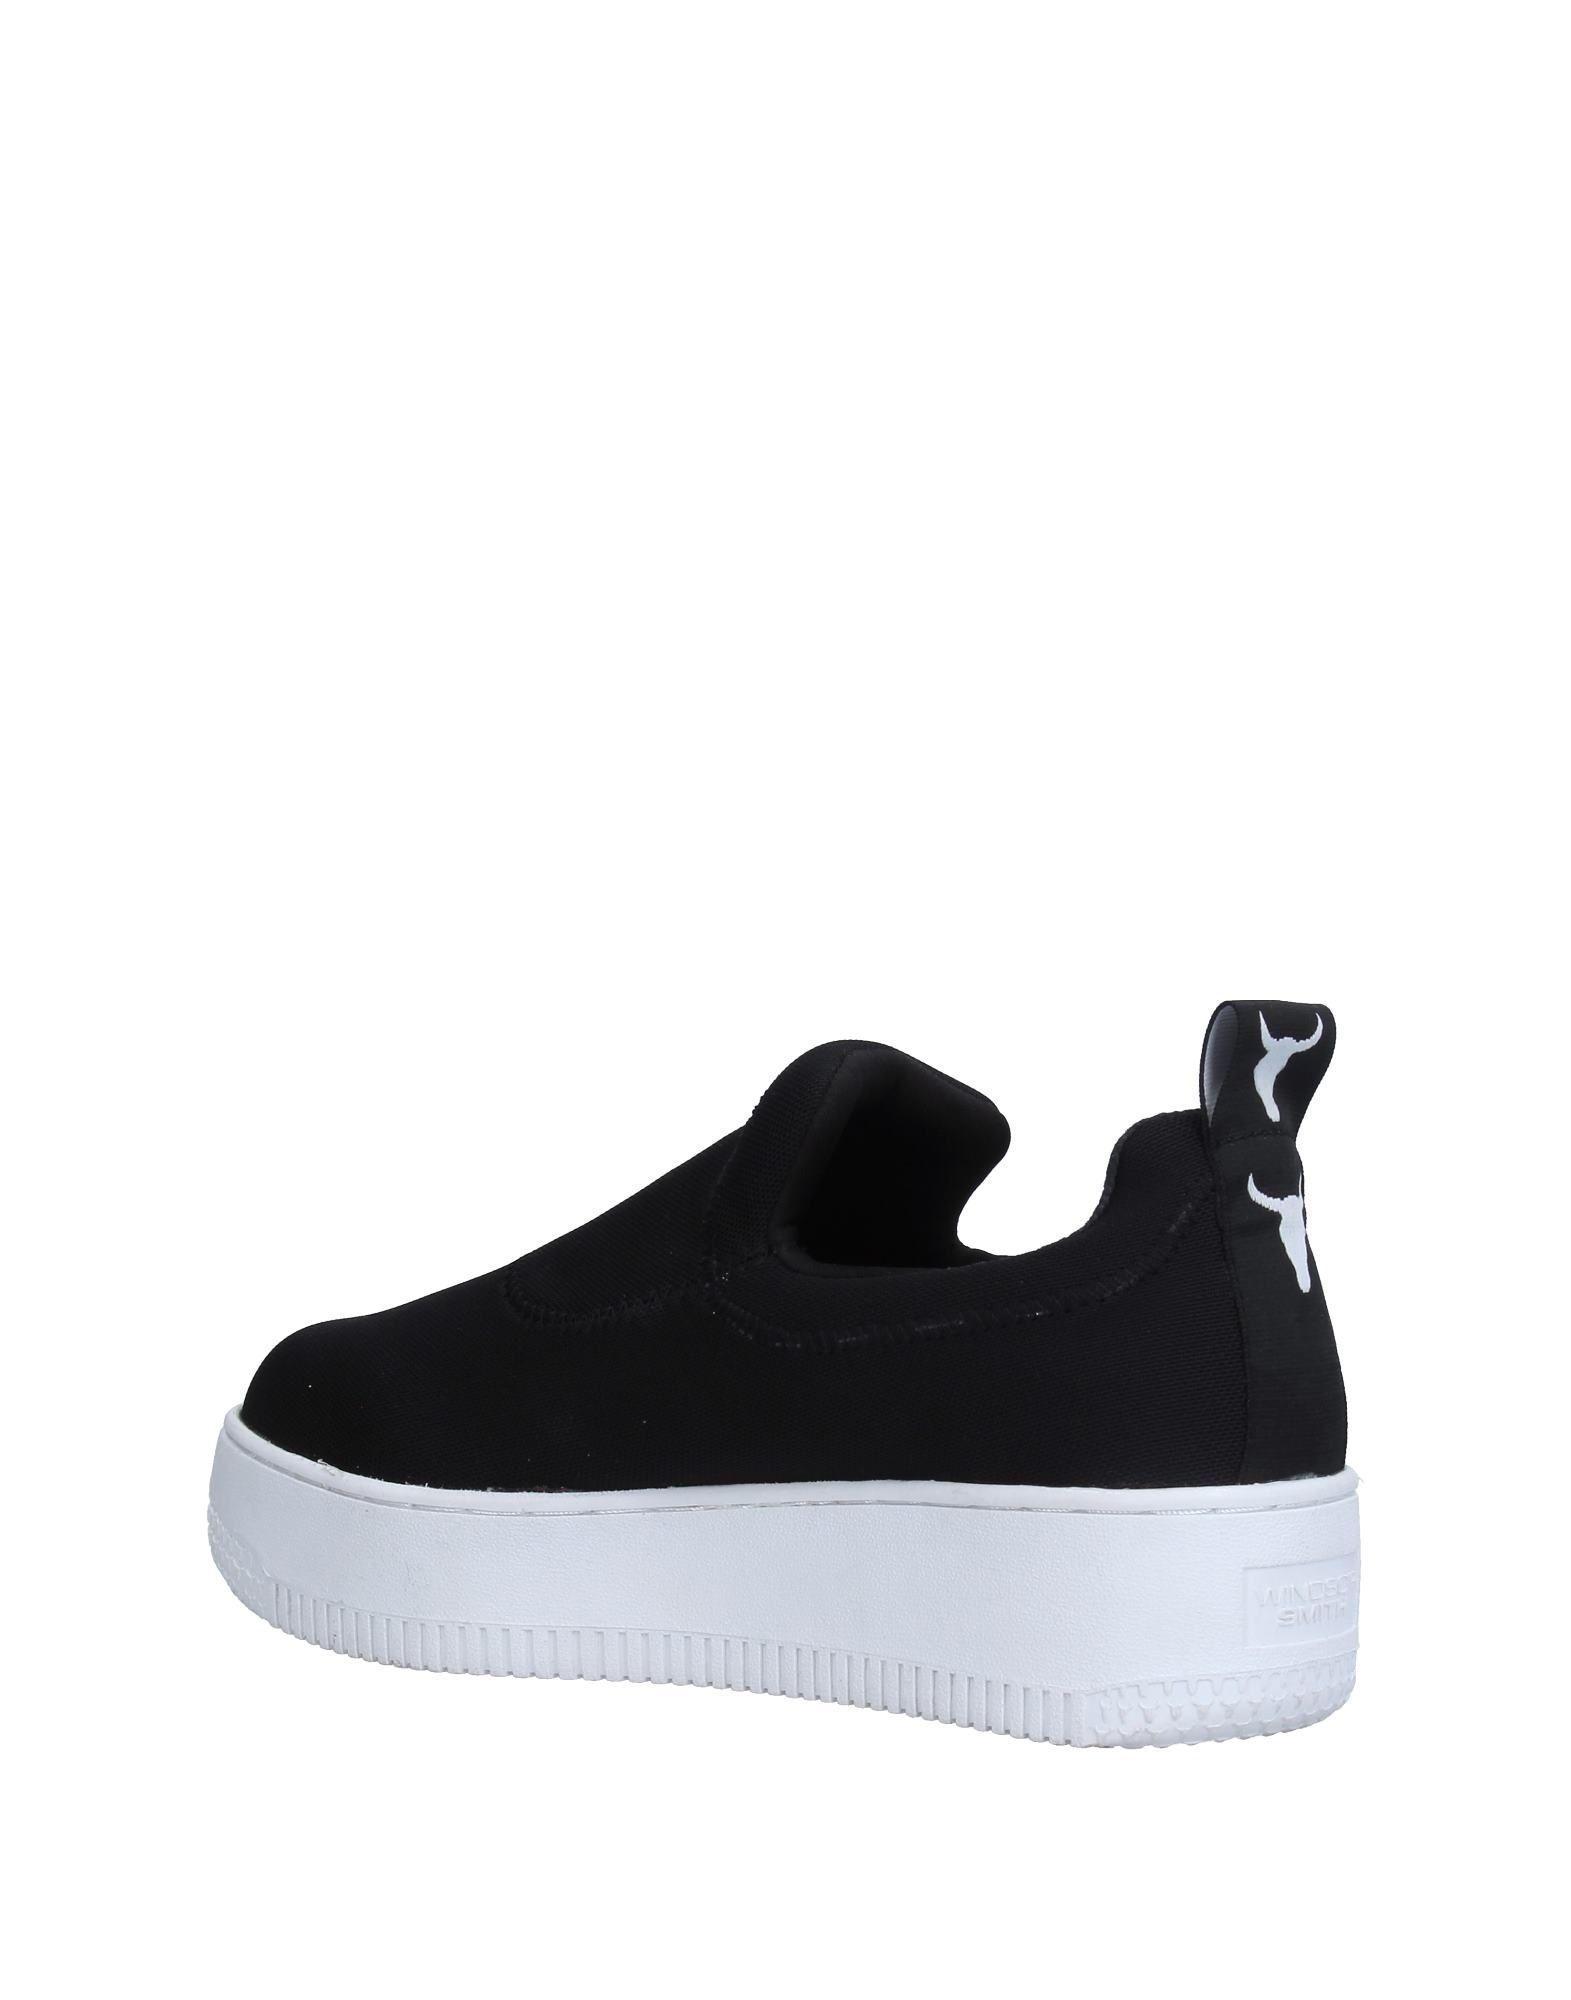 Windsor Smith Damen Sneakers Damen Smith  11220404TH Neue Schuhe b6ff45